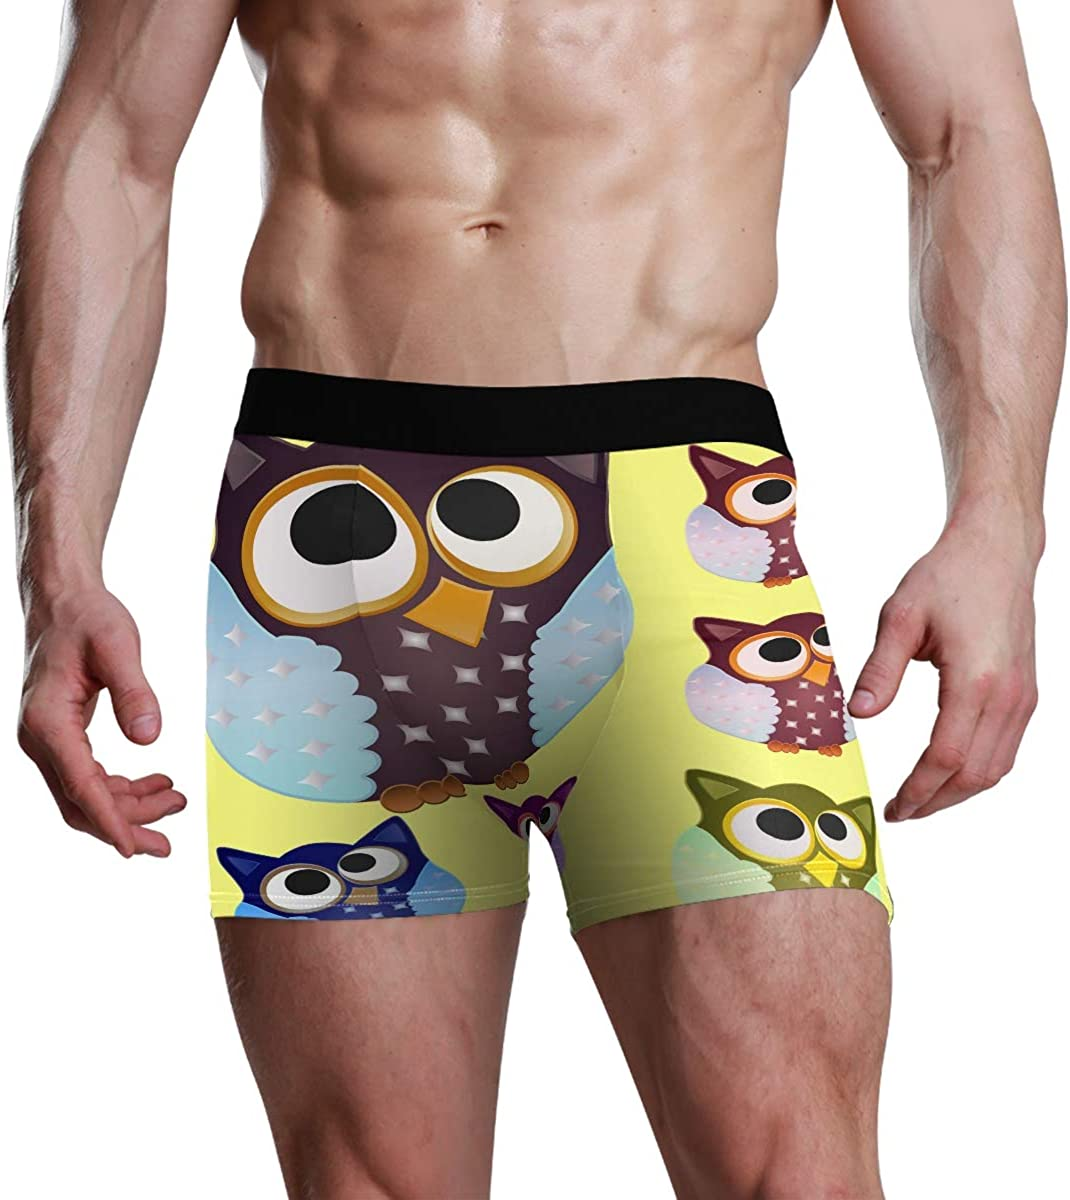 Mens Underwear Briefs Set of Six Brown Owl Breathable Long Boxer Briefs Underwear Boys